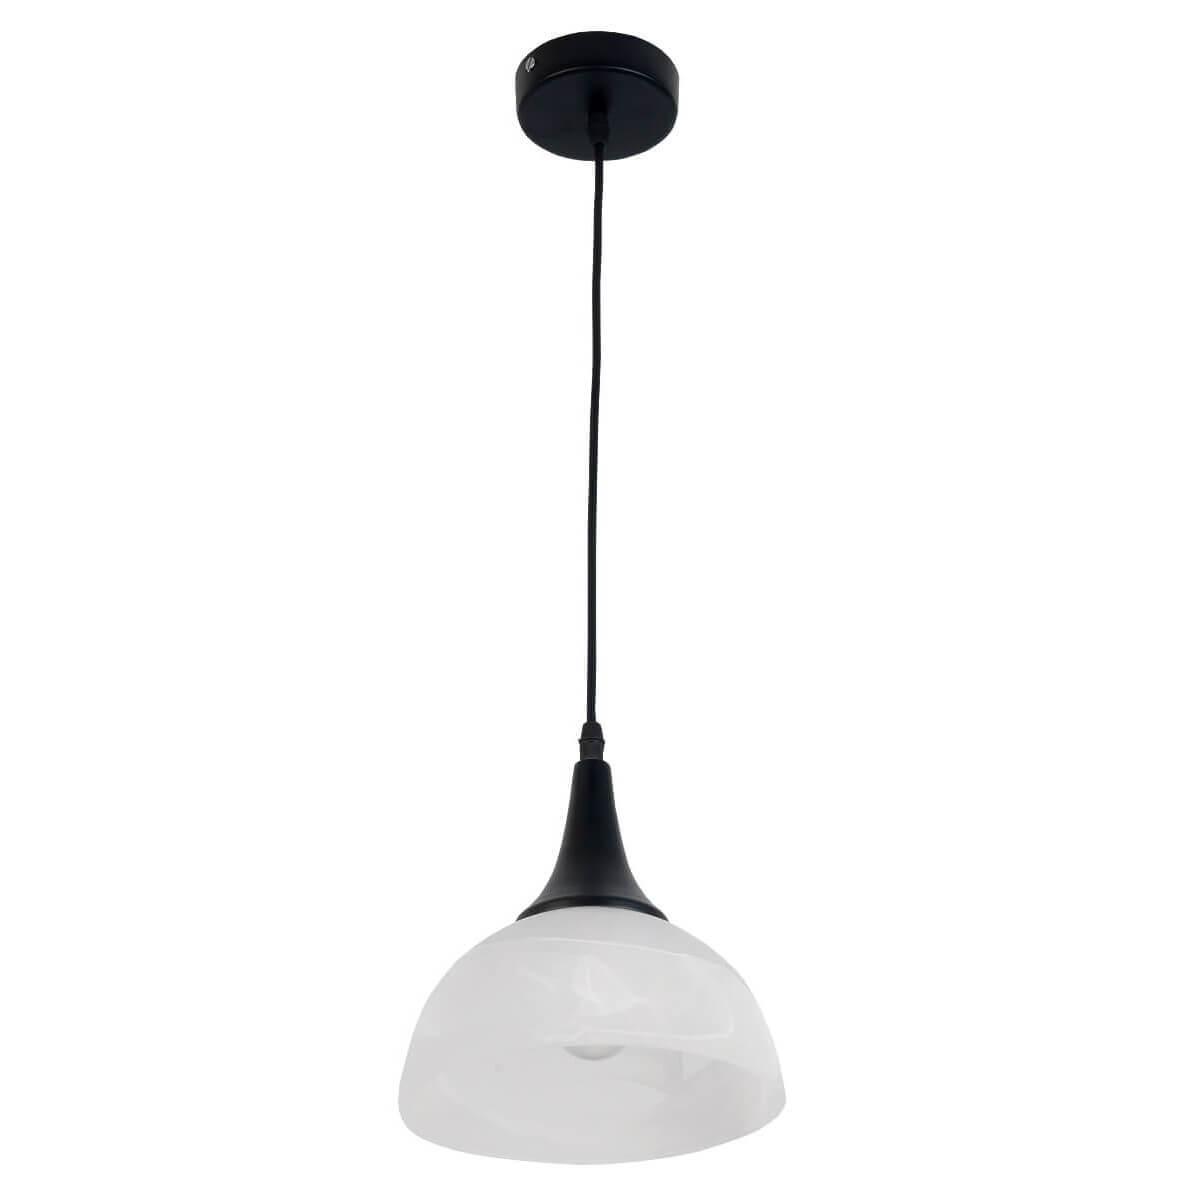 Светильник Toplight TL4420D-01BL Adelia бра toplight donna tl7510b 01bl